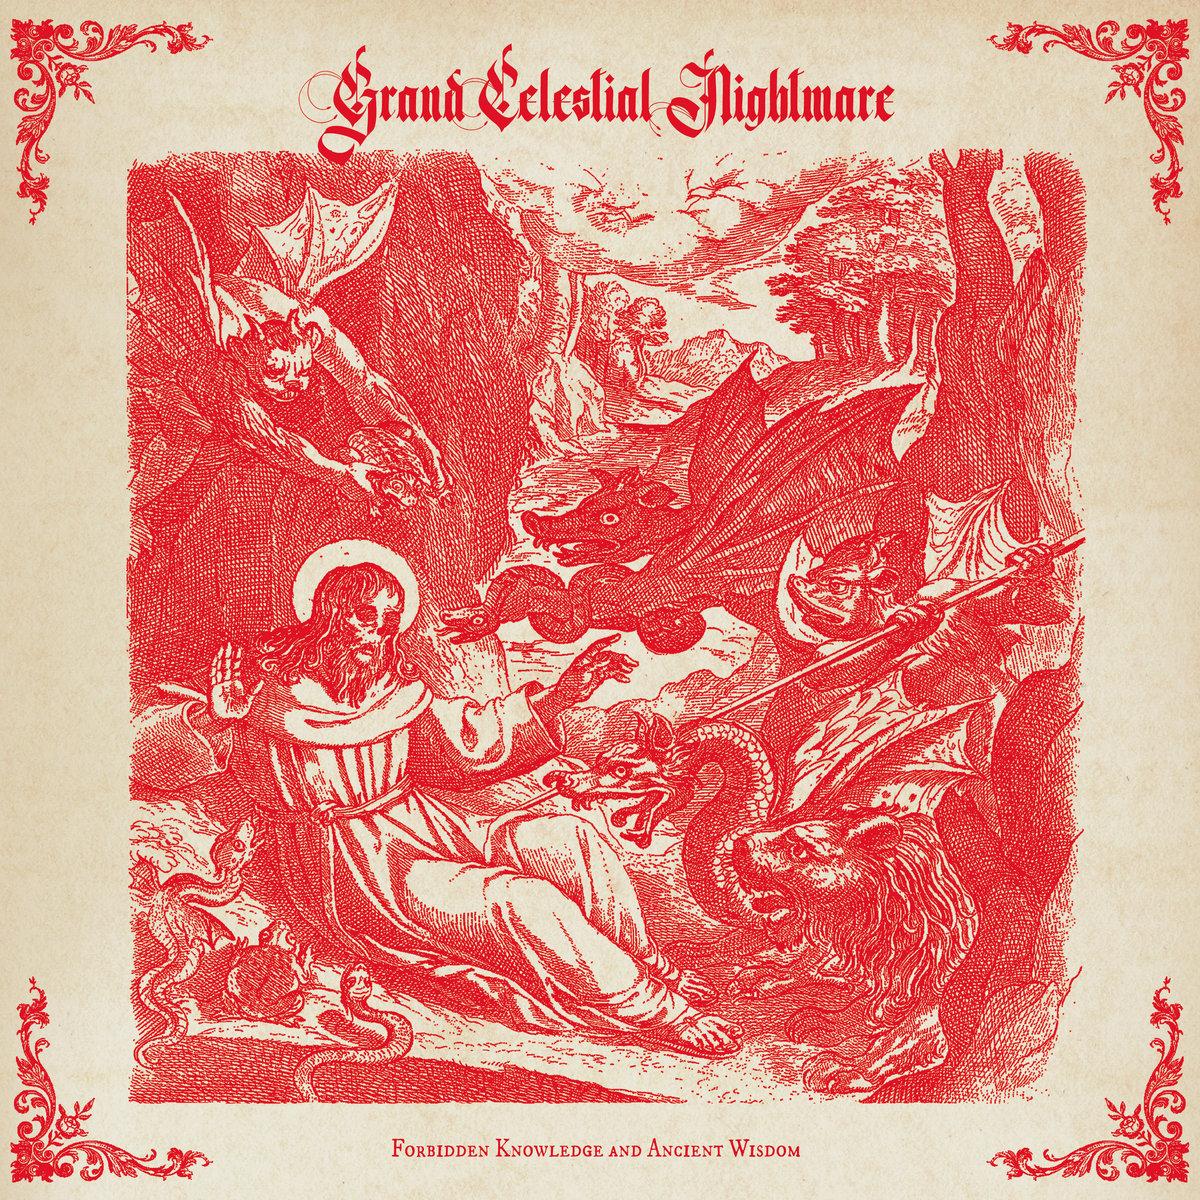 Grand Celestial Nightmare Forbidden Knowledge and Ancient Wisdom Album Cover Artwork